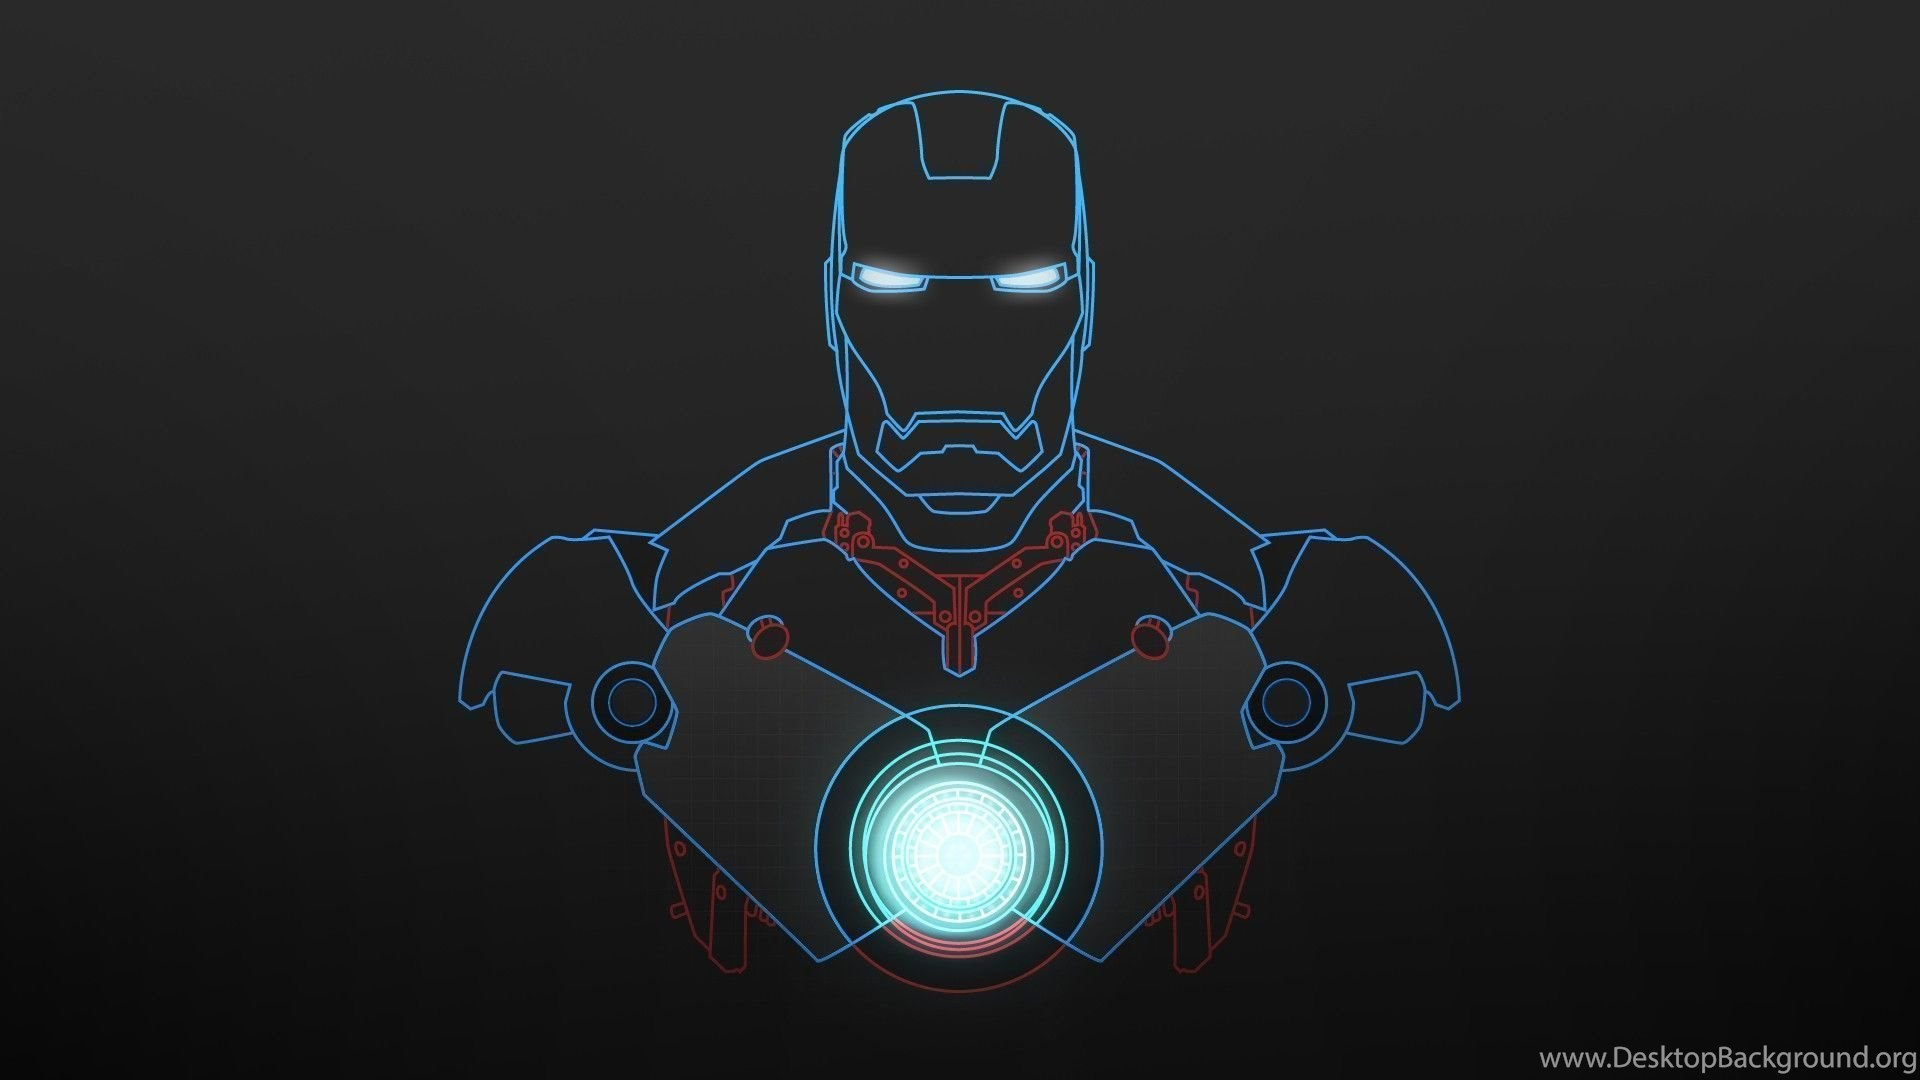 Marvel wallpapers hd free download desktop background - Marvel android wallpaper hd ...